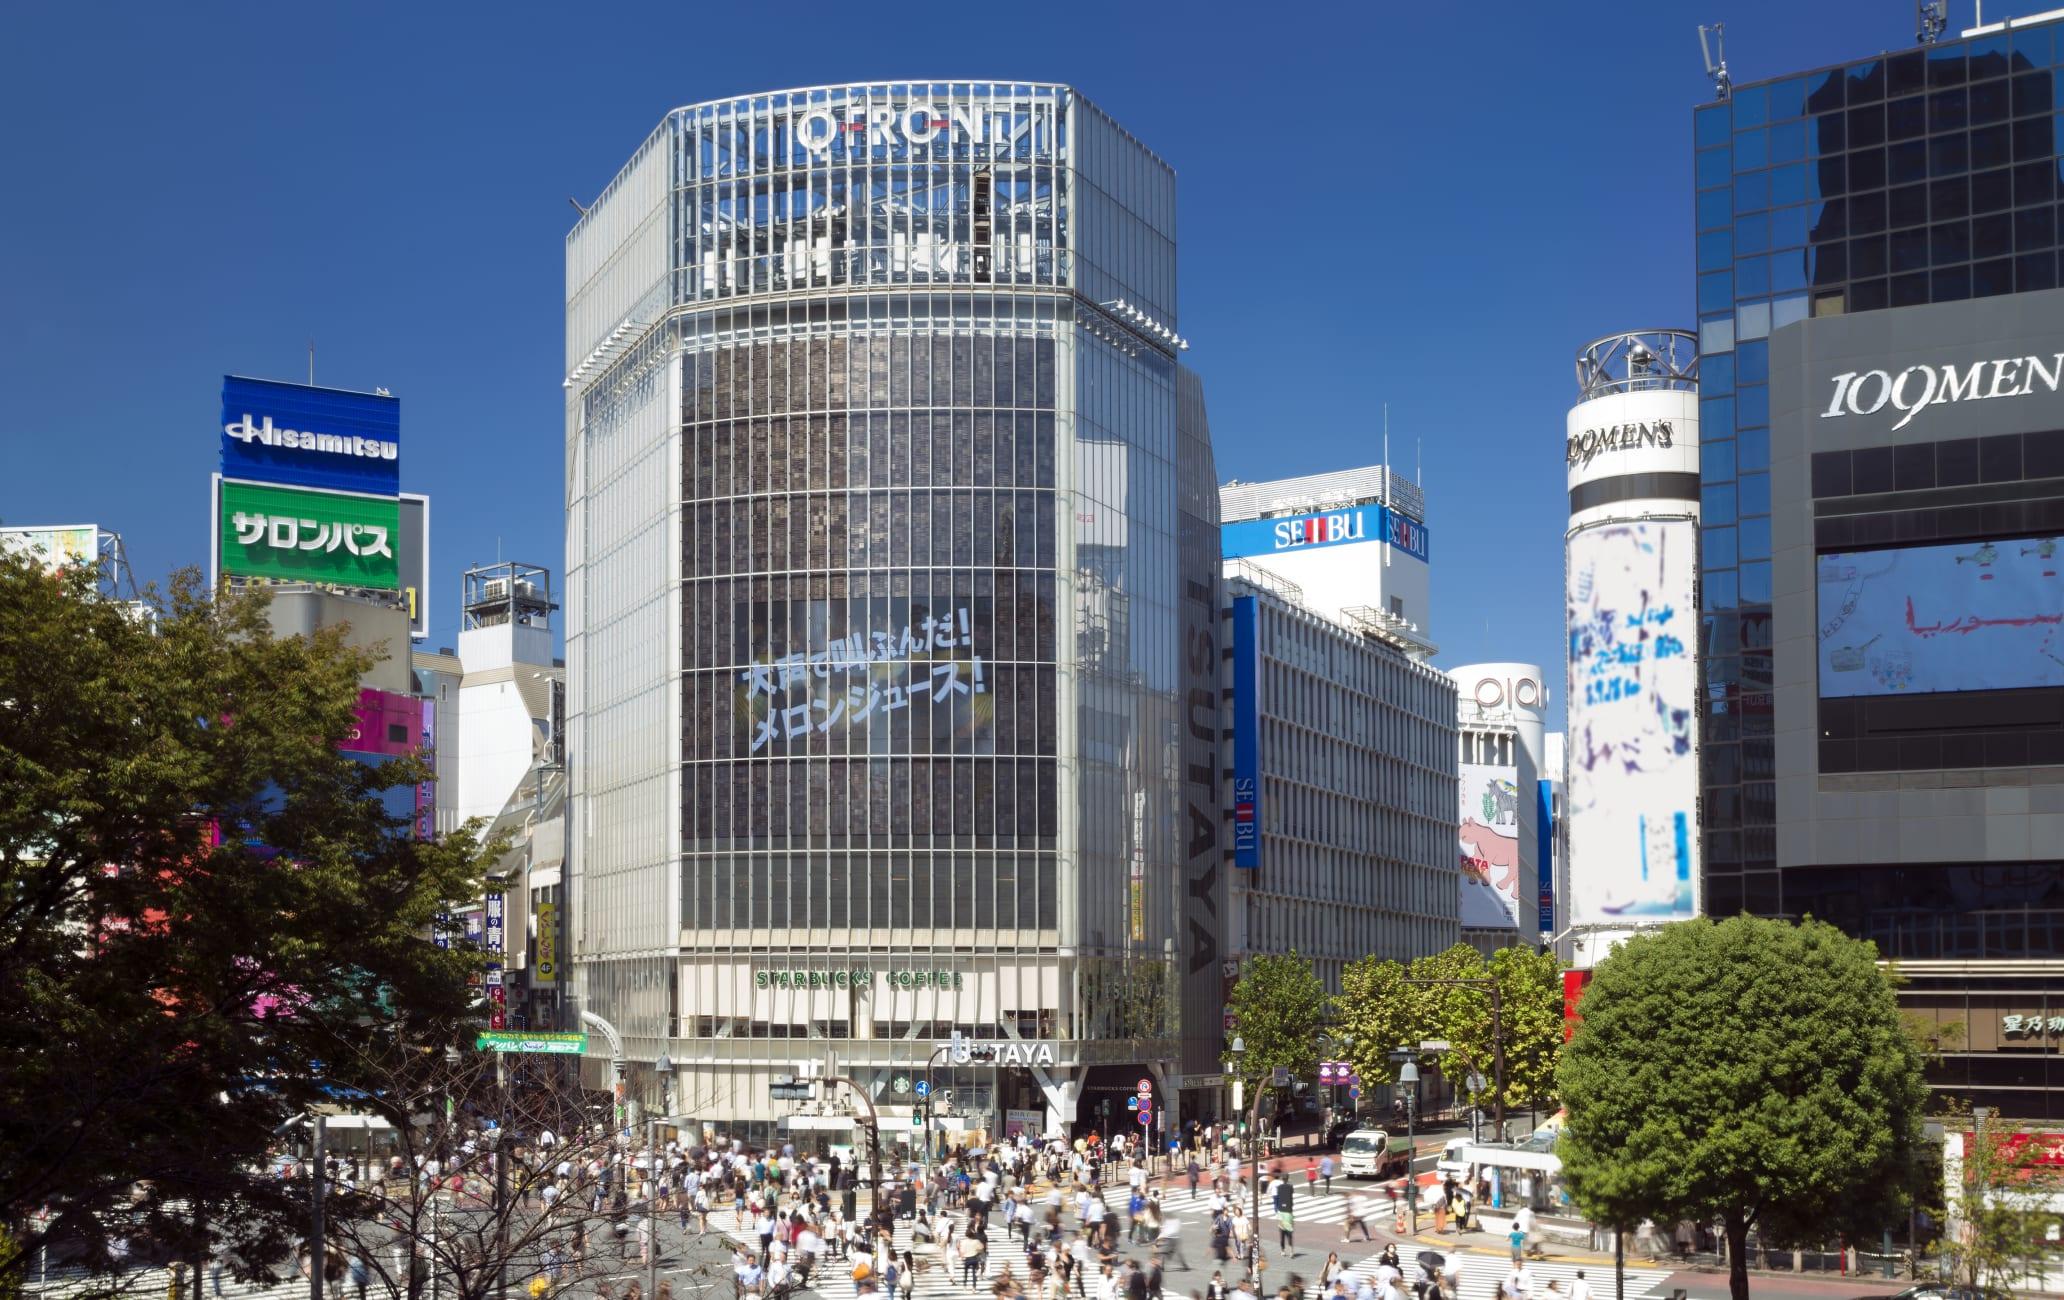 Shibuya Area